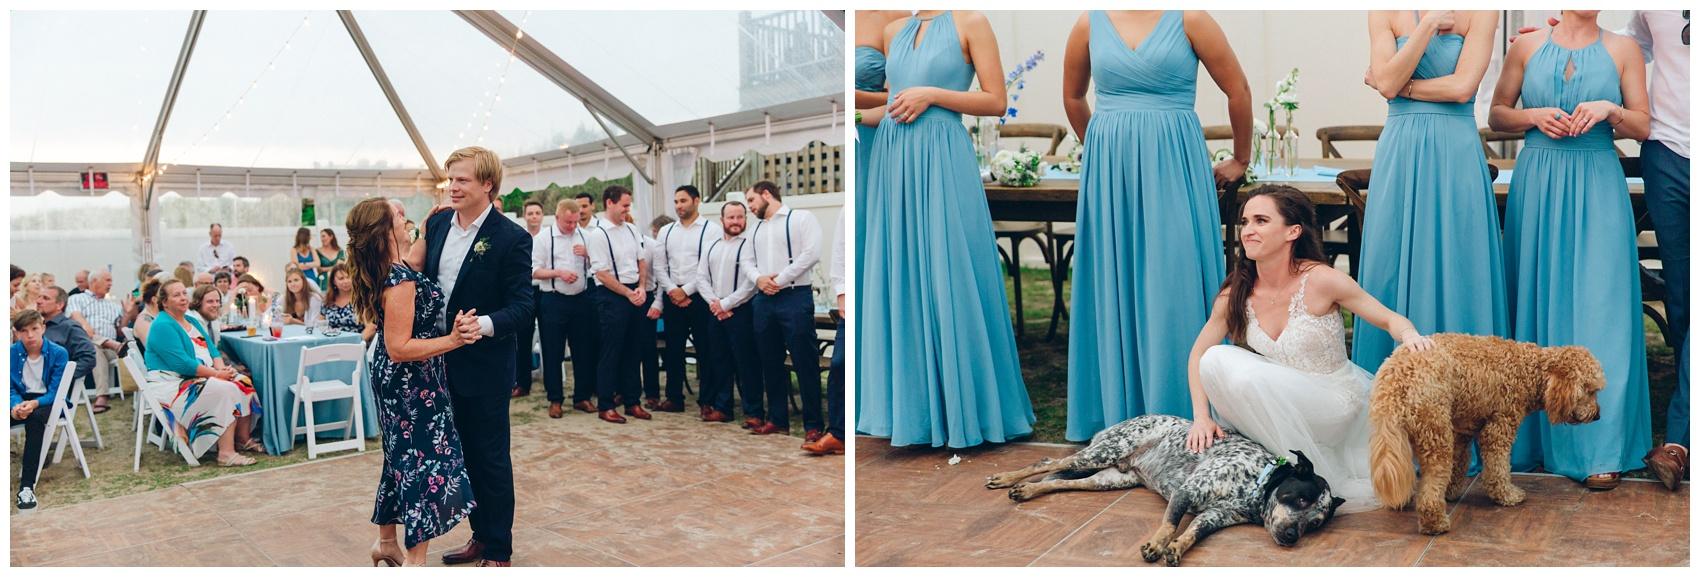 Outer-Banks-Corolla-Wedding_0112.jpg